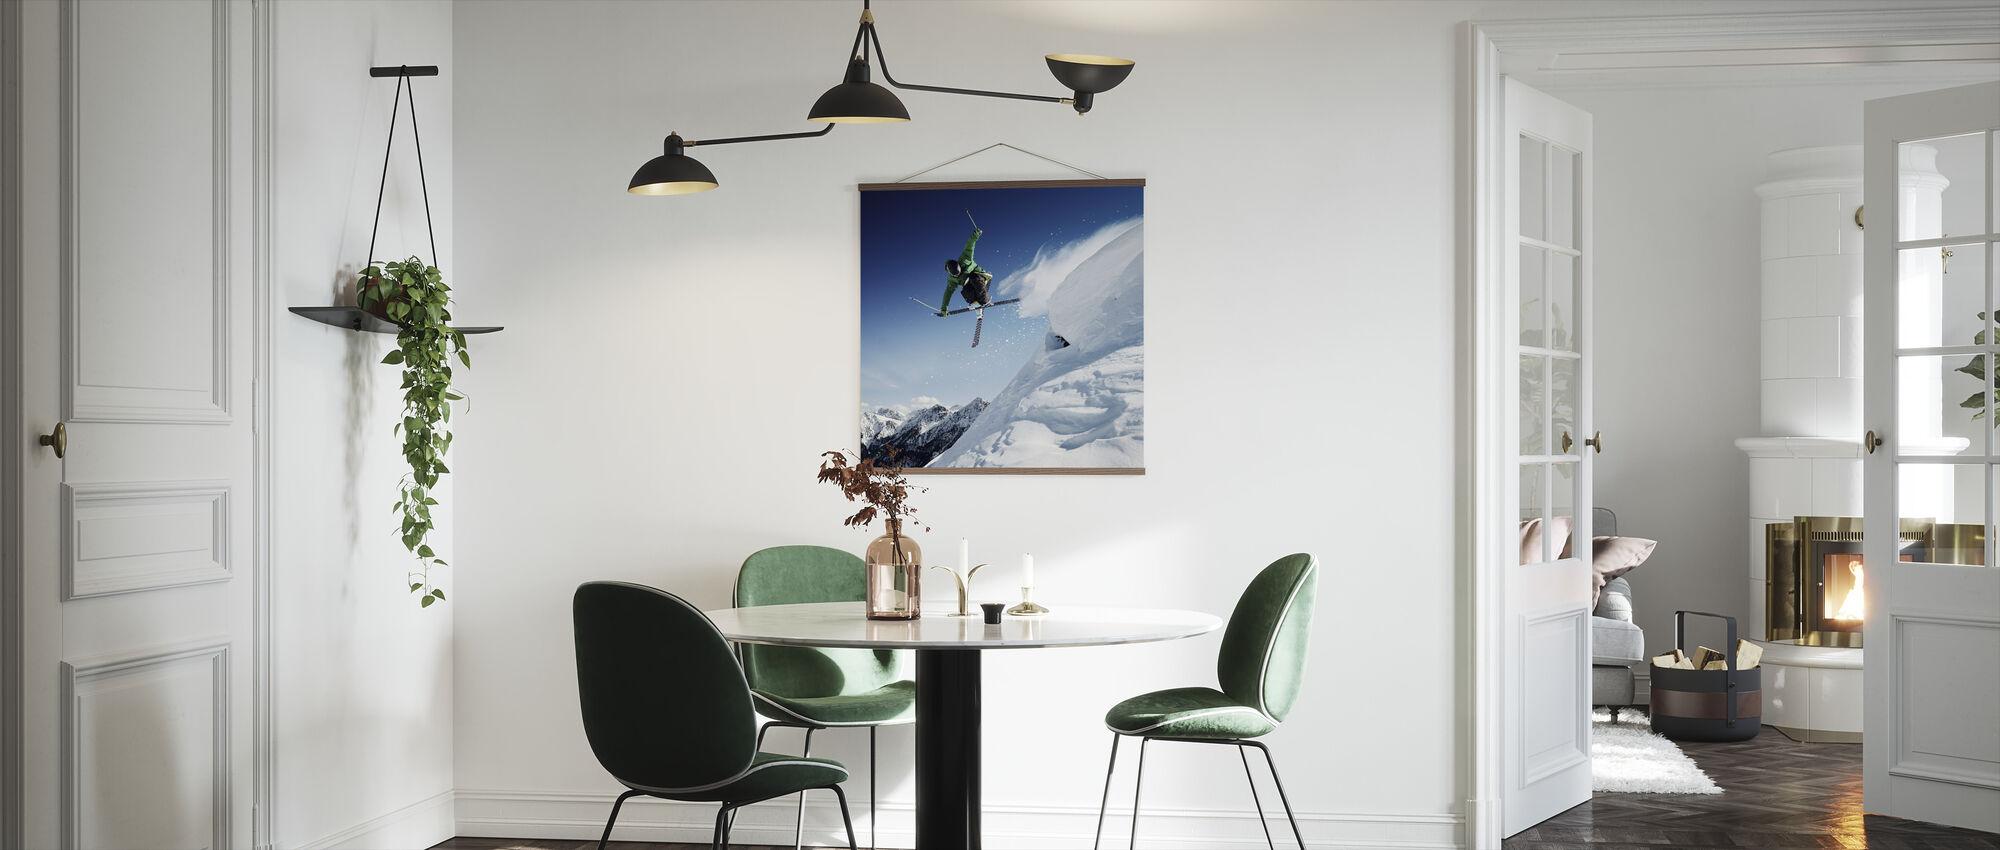 Jumping Skier - Poster - Kitchen